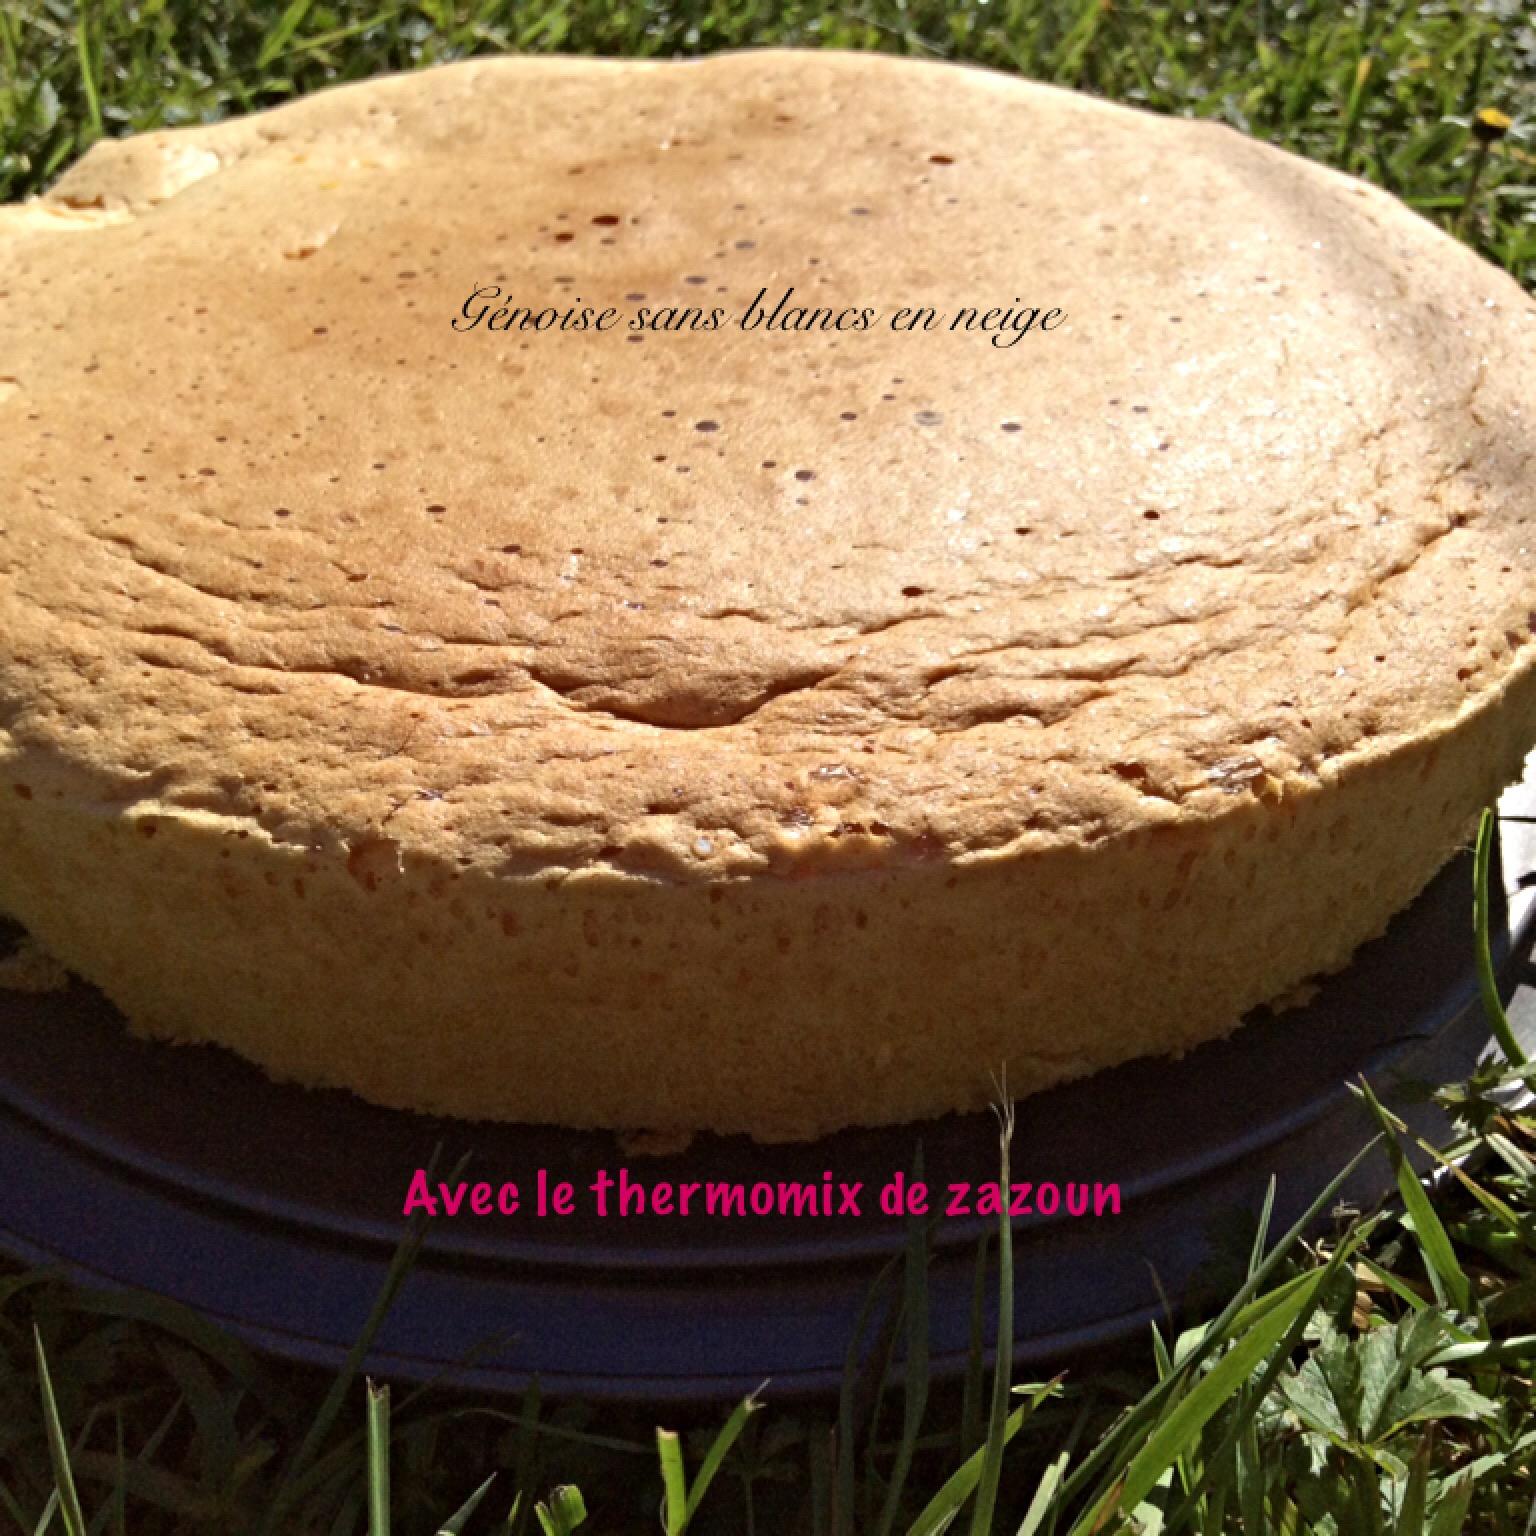 Gateau sucre courgette thermomix